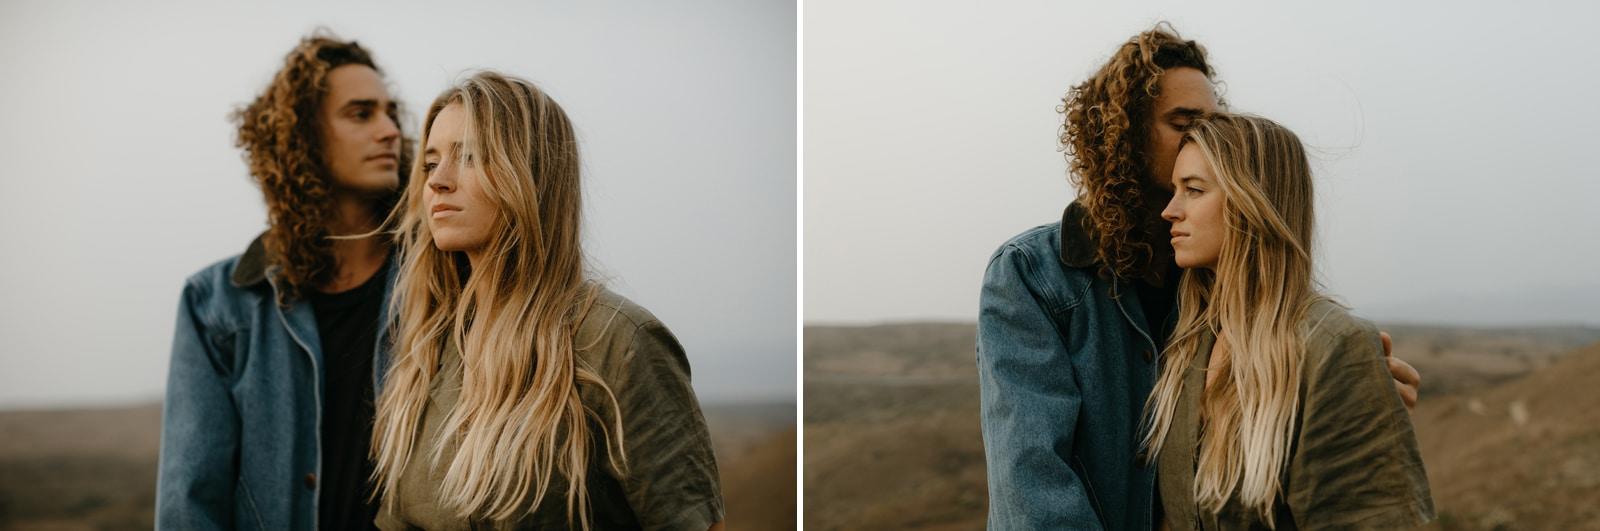 040-intimate-portraits